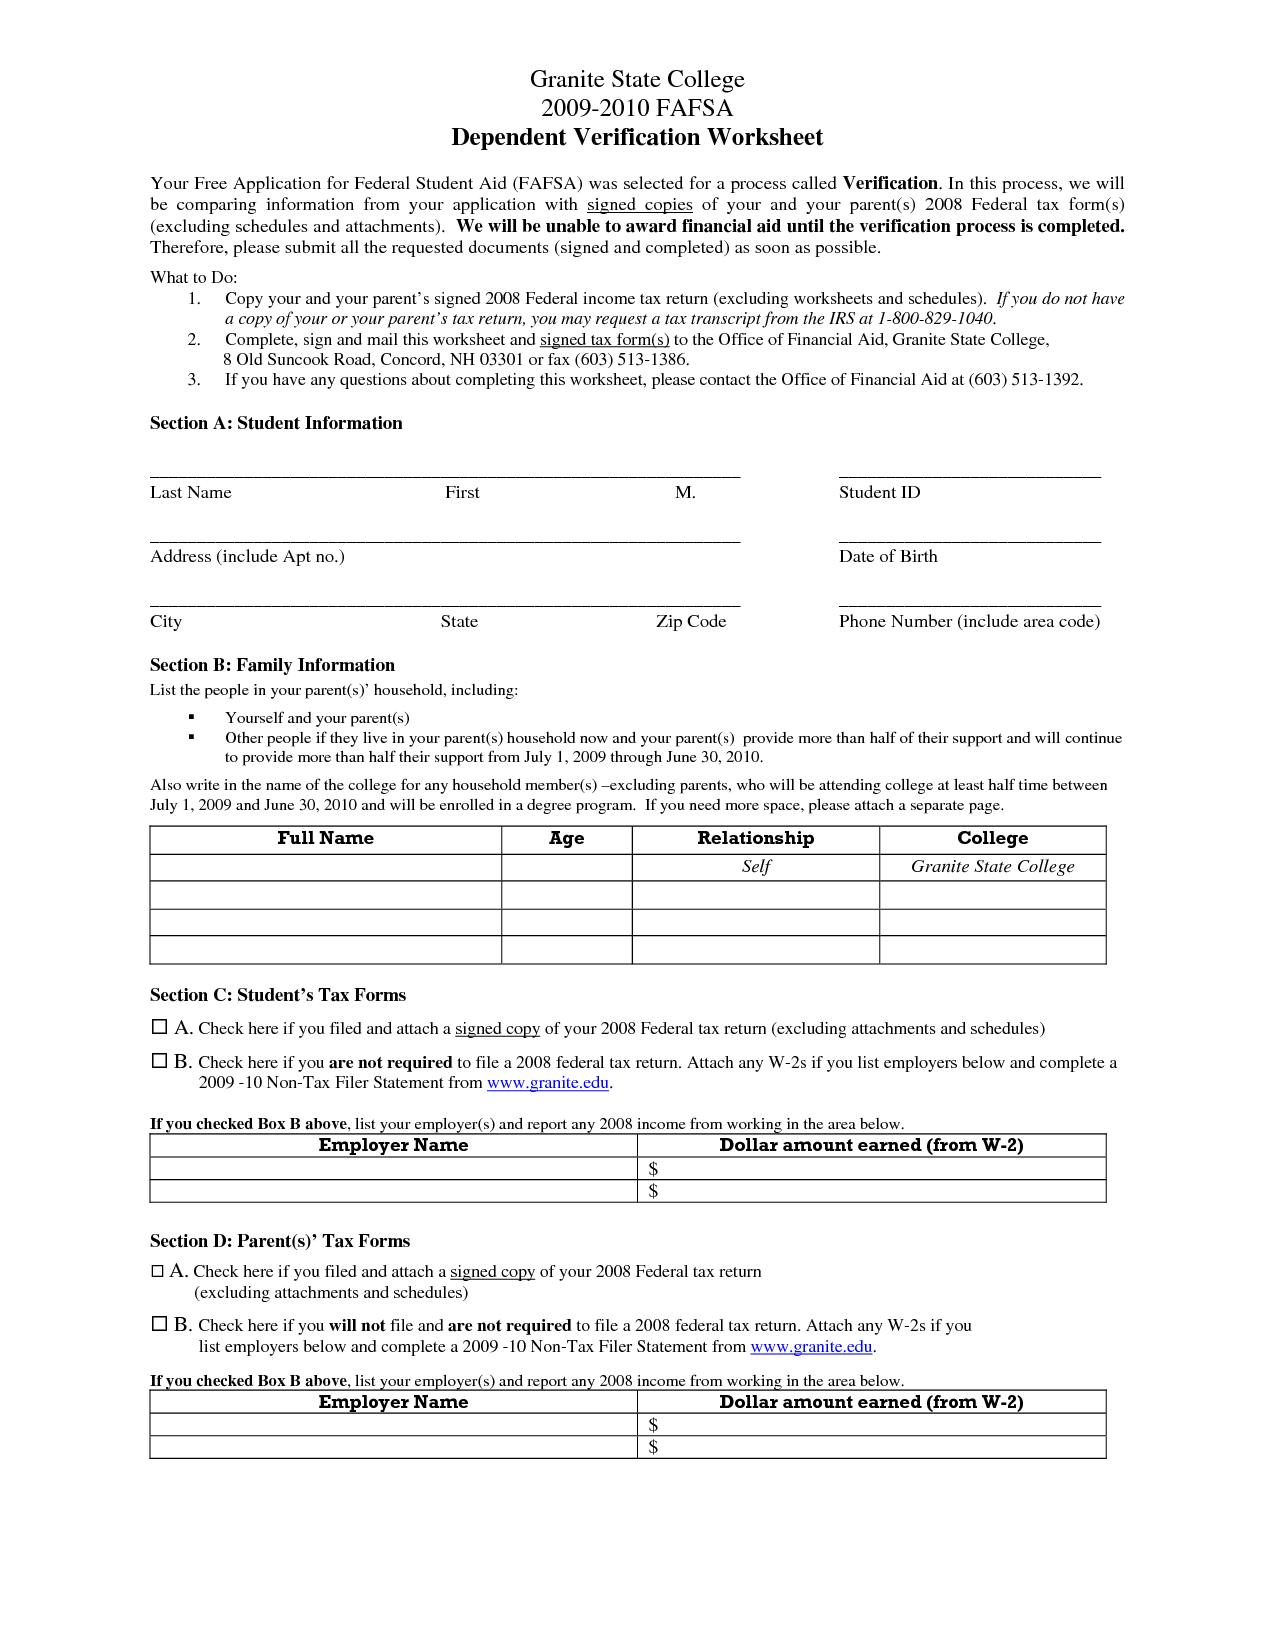 Uncg Verification Worksheet